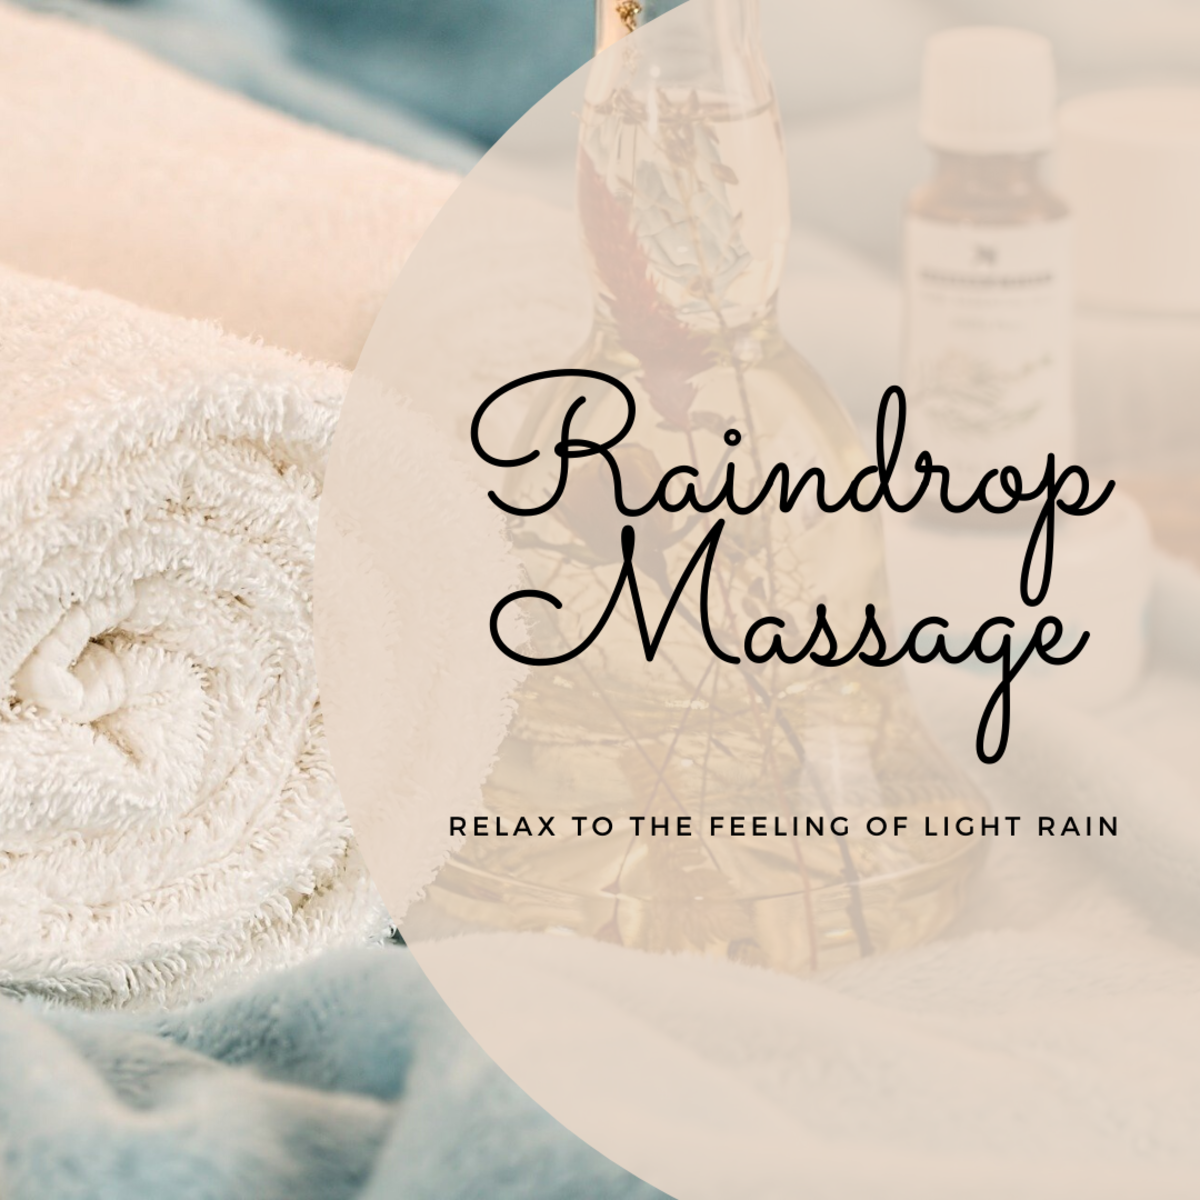 Exploring the Raindrop Massage Technique